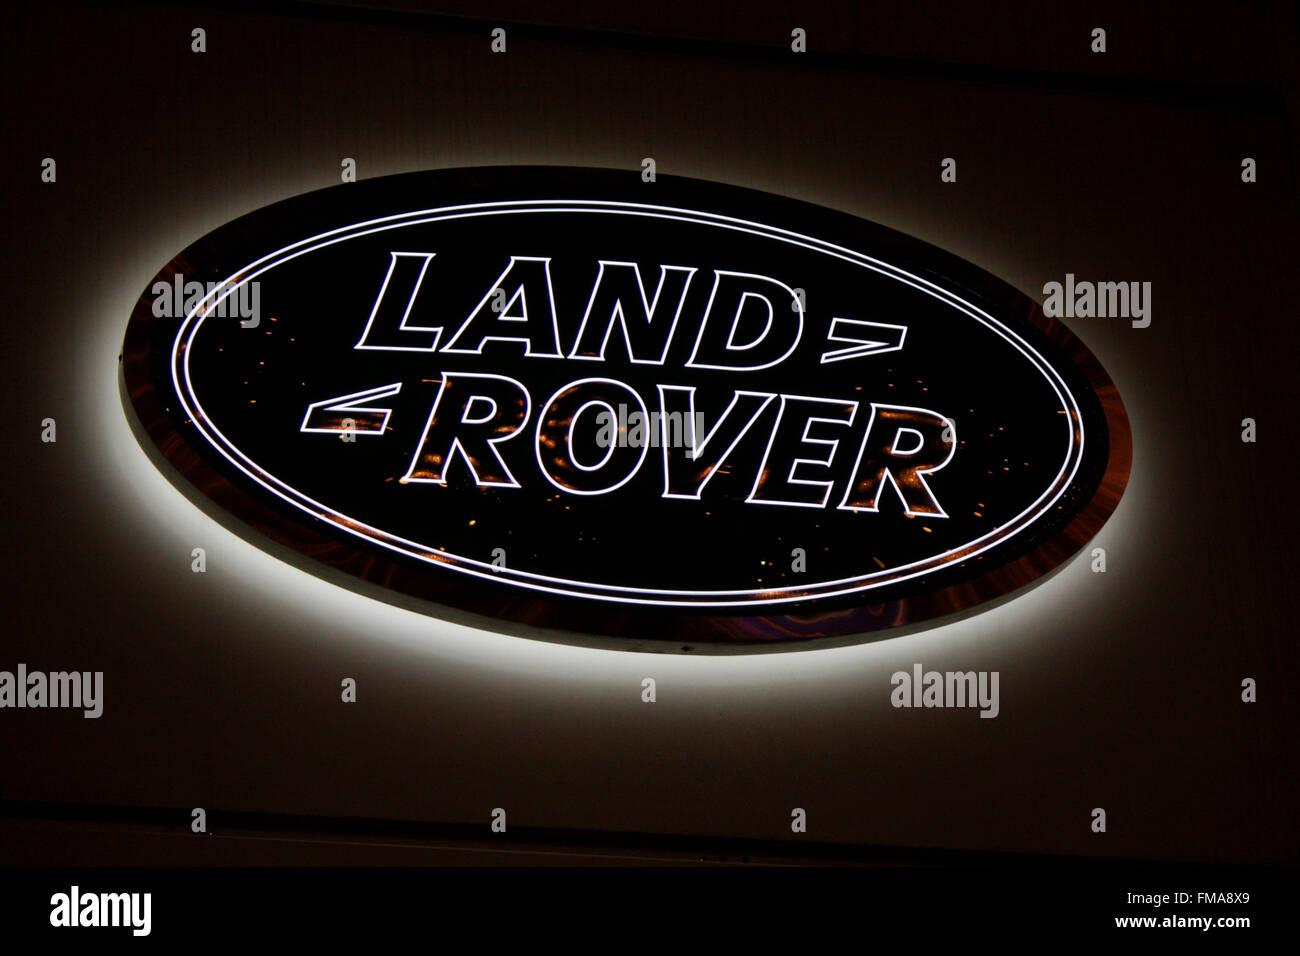 Markenname: 'Land Rover', Dezember 2013, Berlin. - Stock Image